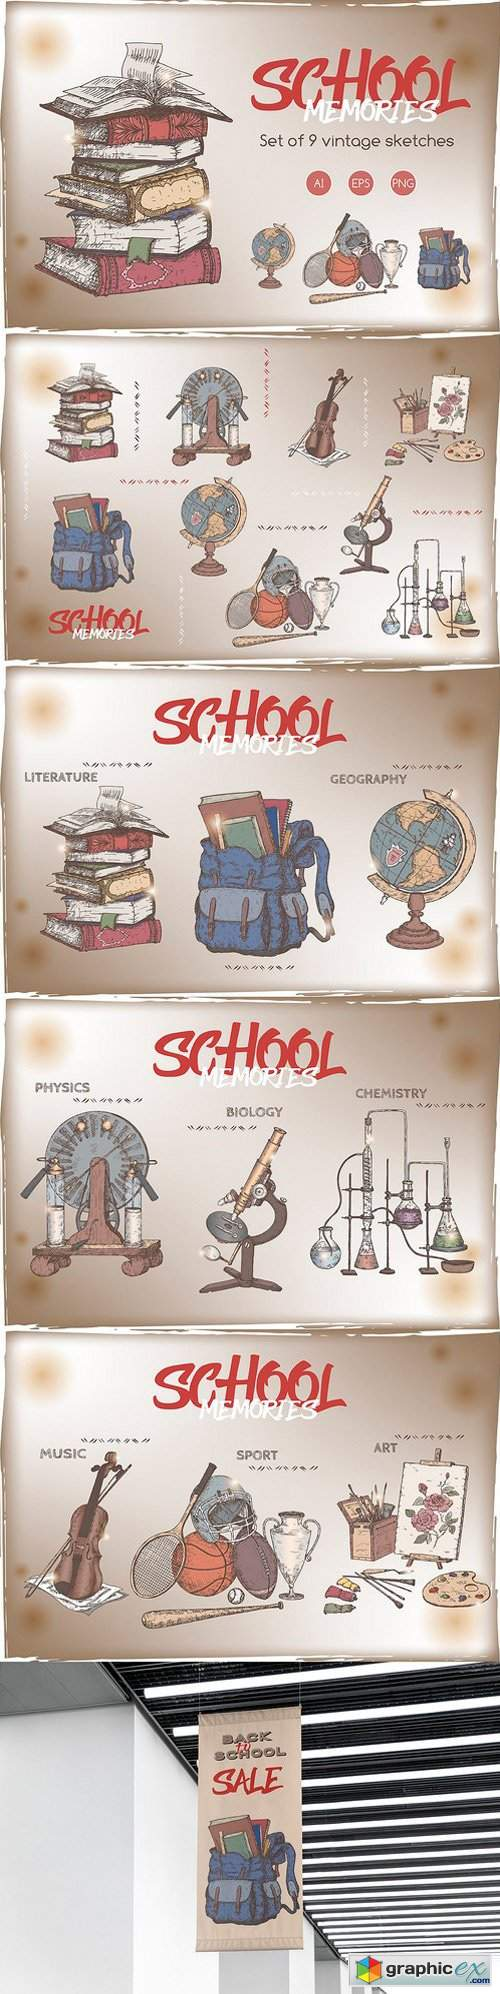 School memories vintage sketch set